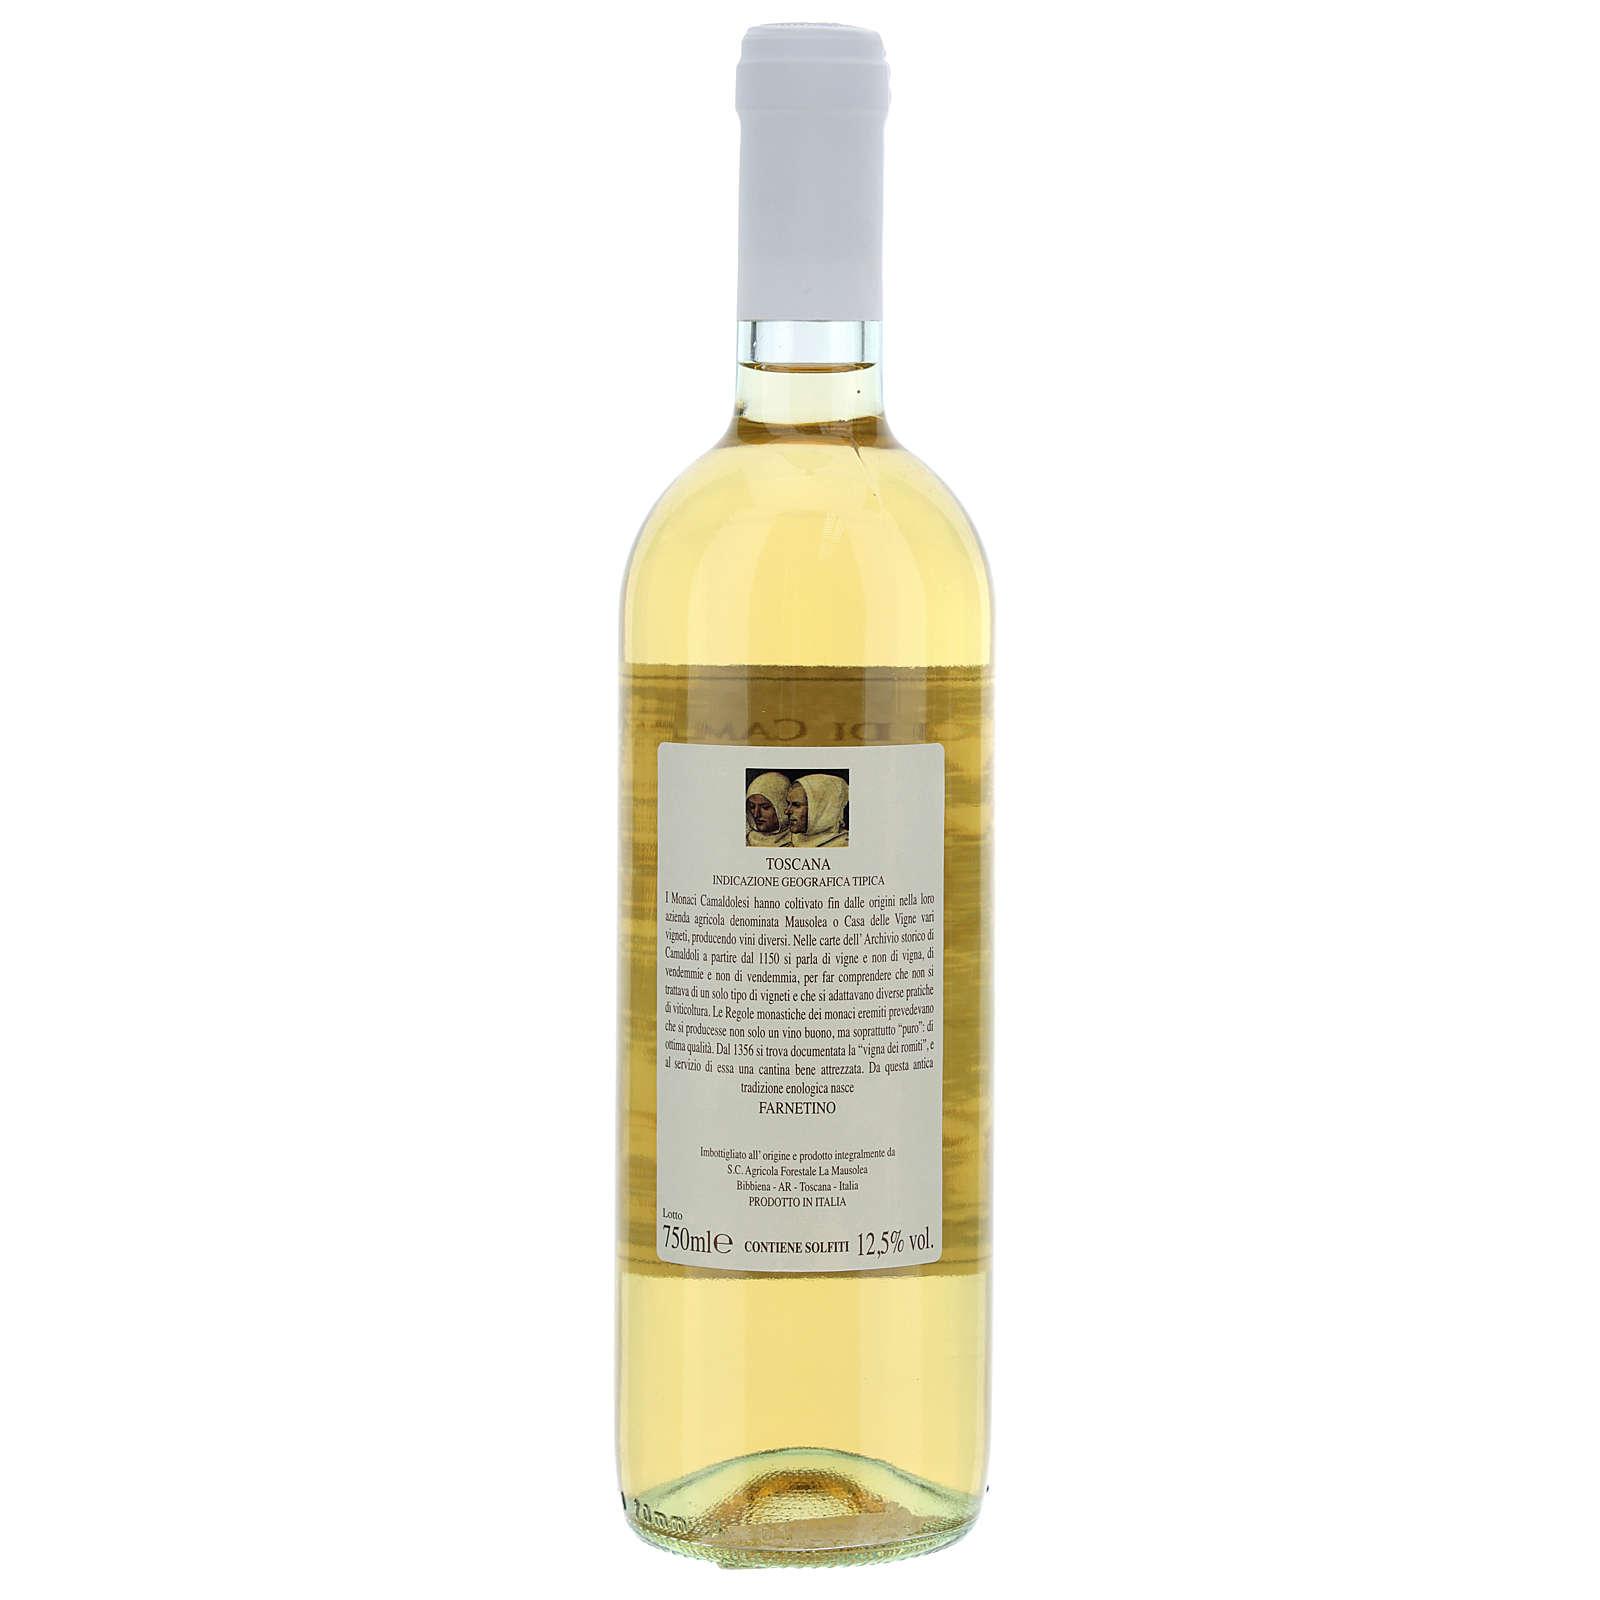 Vino bianco toscano Borbotto 750 ml. 2017 3